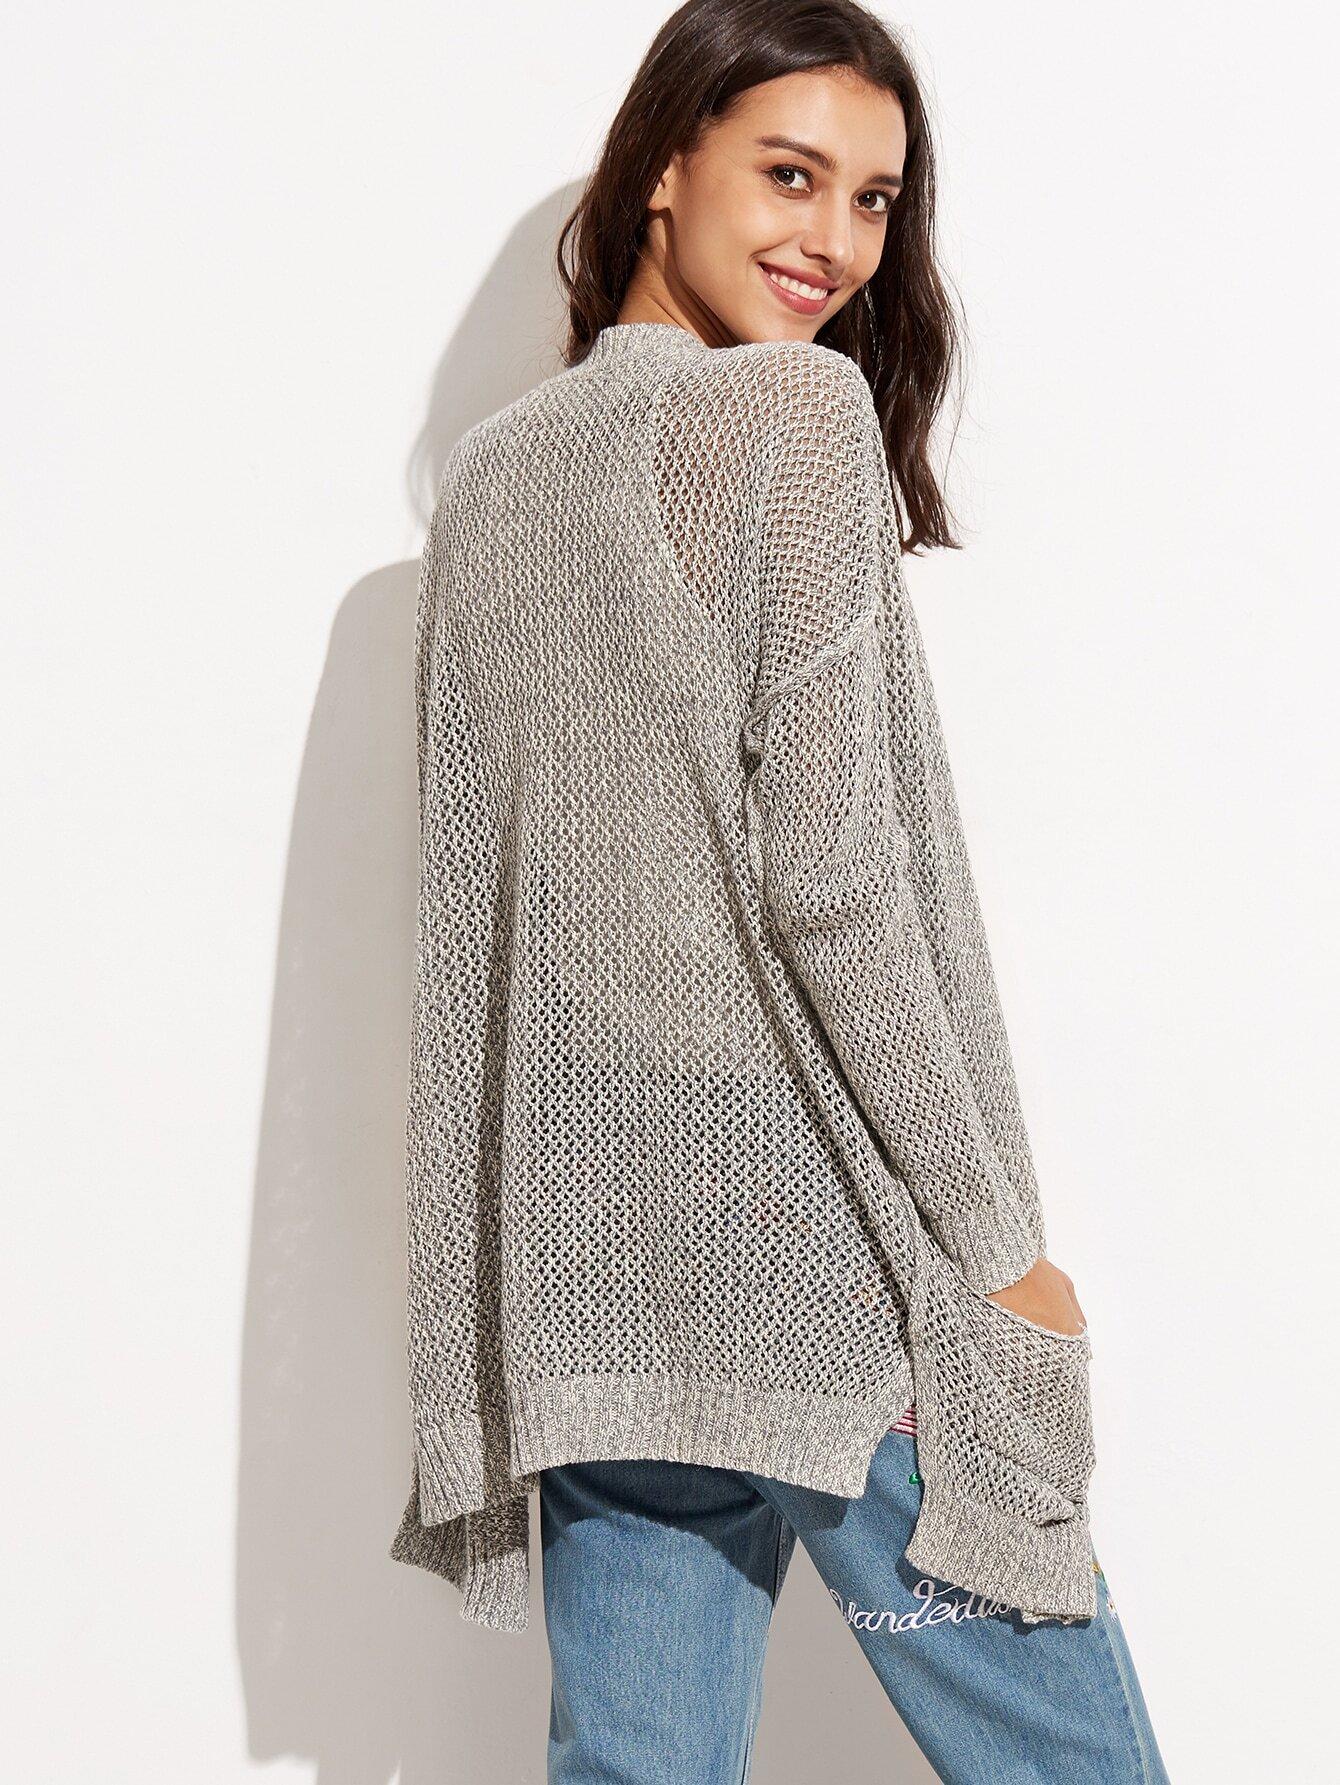 sweater160829454_4